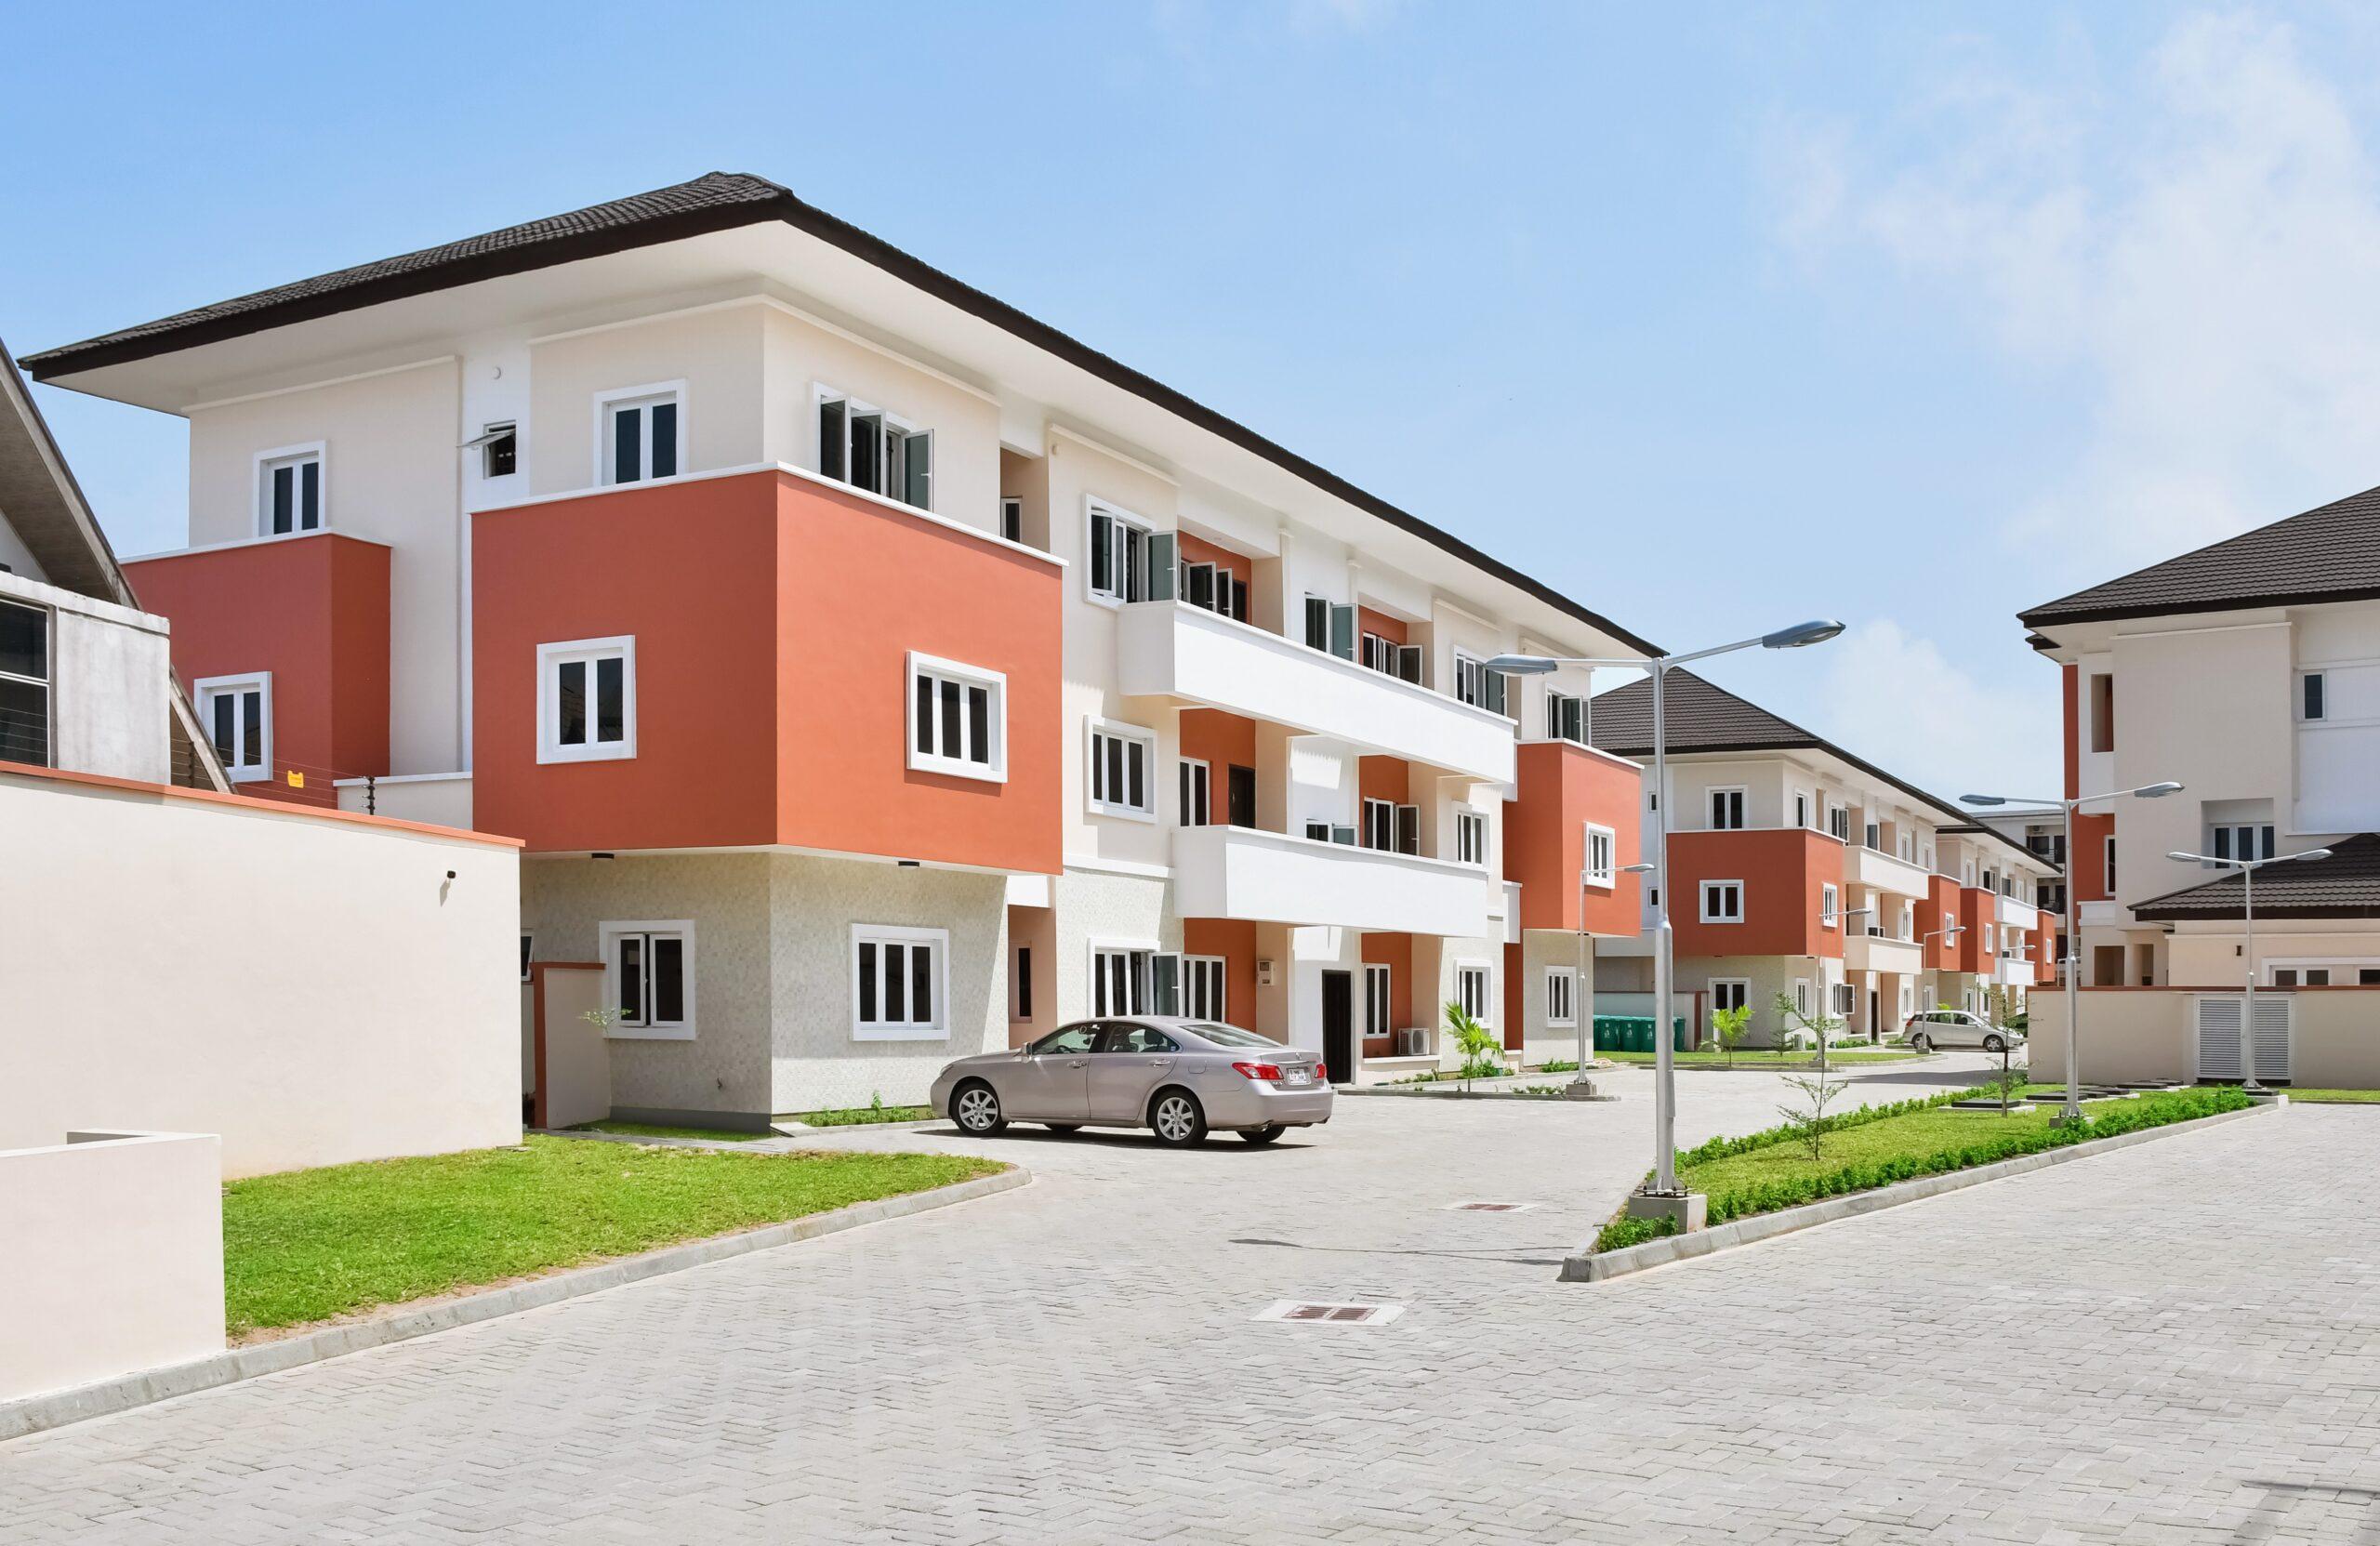 milano-courts-estate-lagos4a